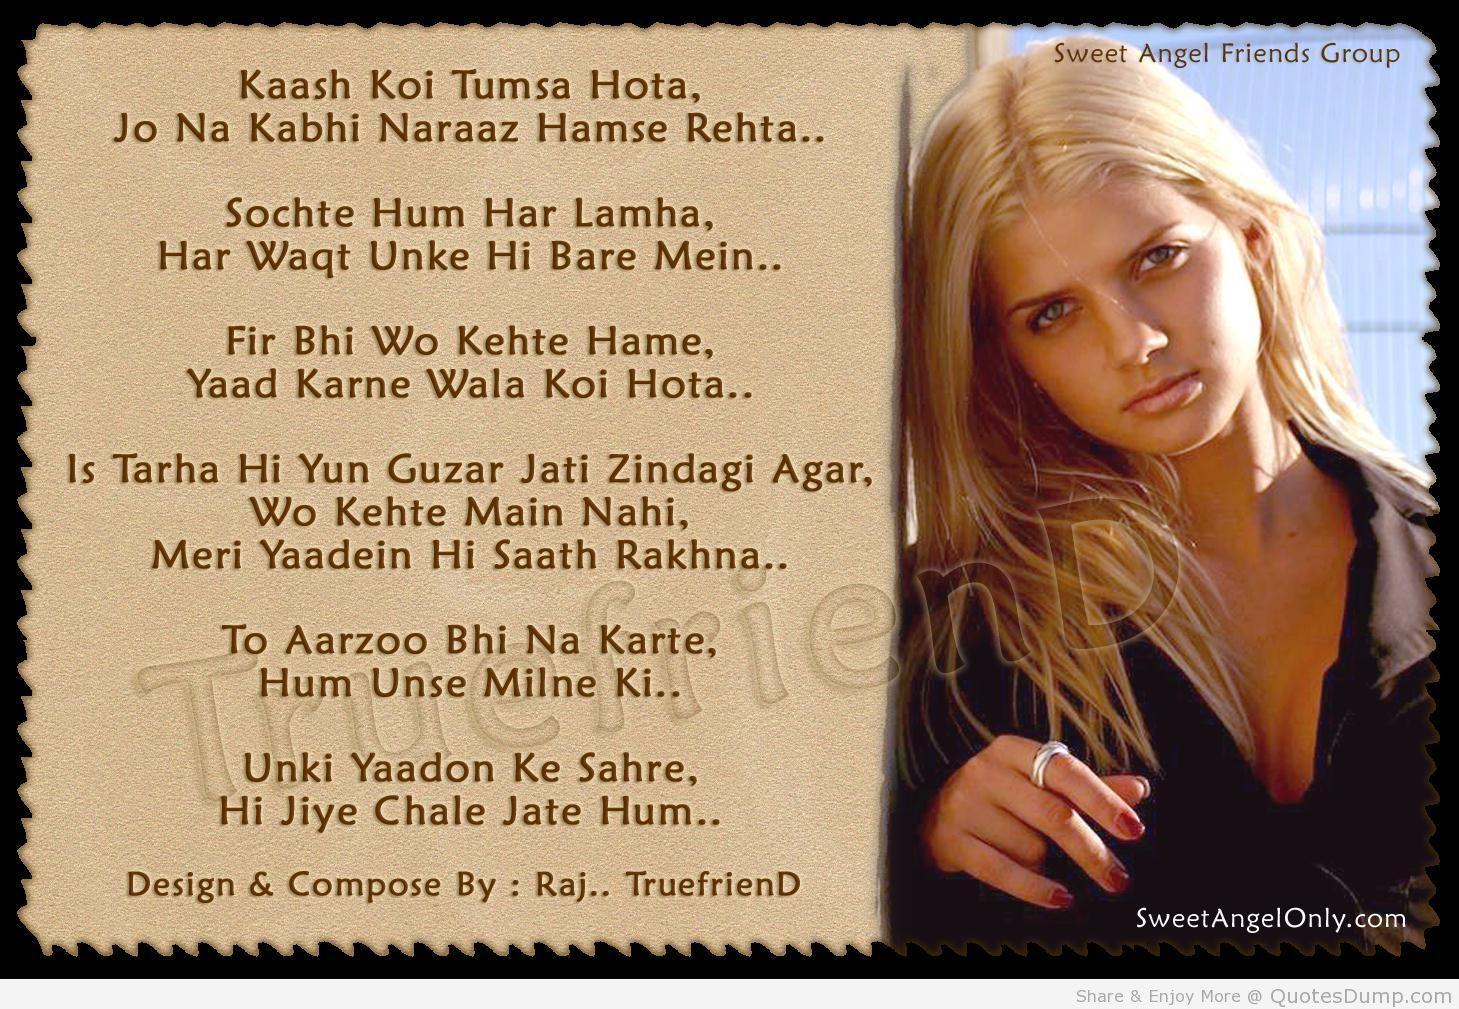 Sad Love Quotes And Sayings Quotesgram: Sad Love Quotes In Hindi. QuotesGram